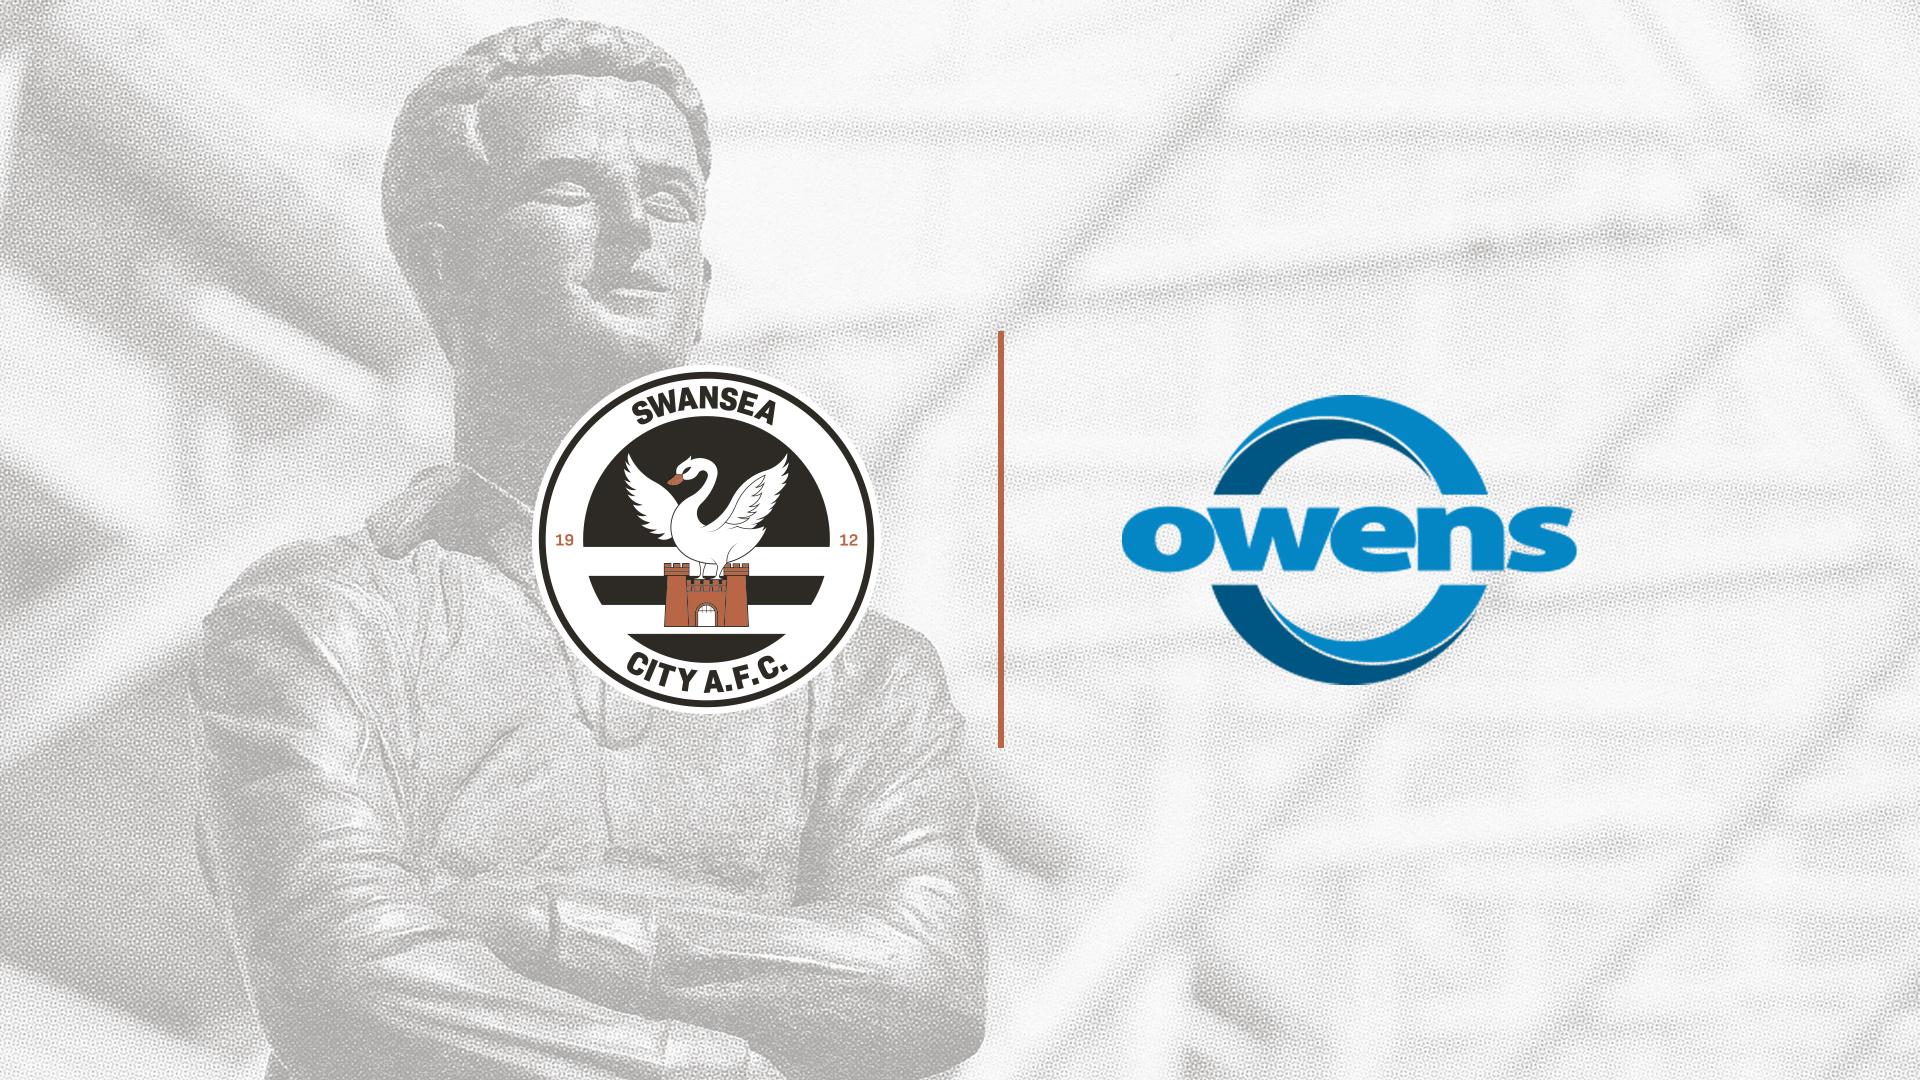 Swans x Owens